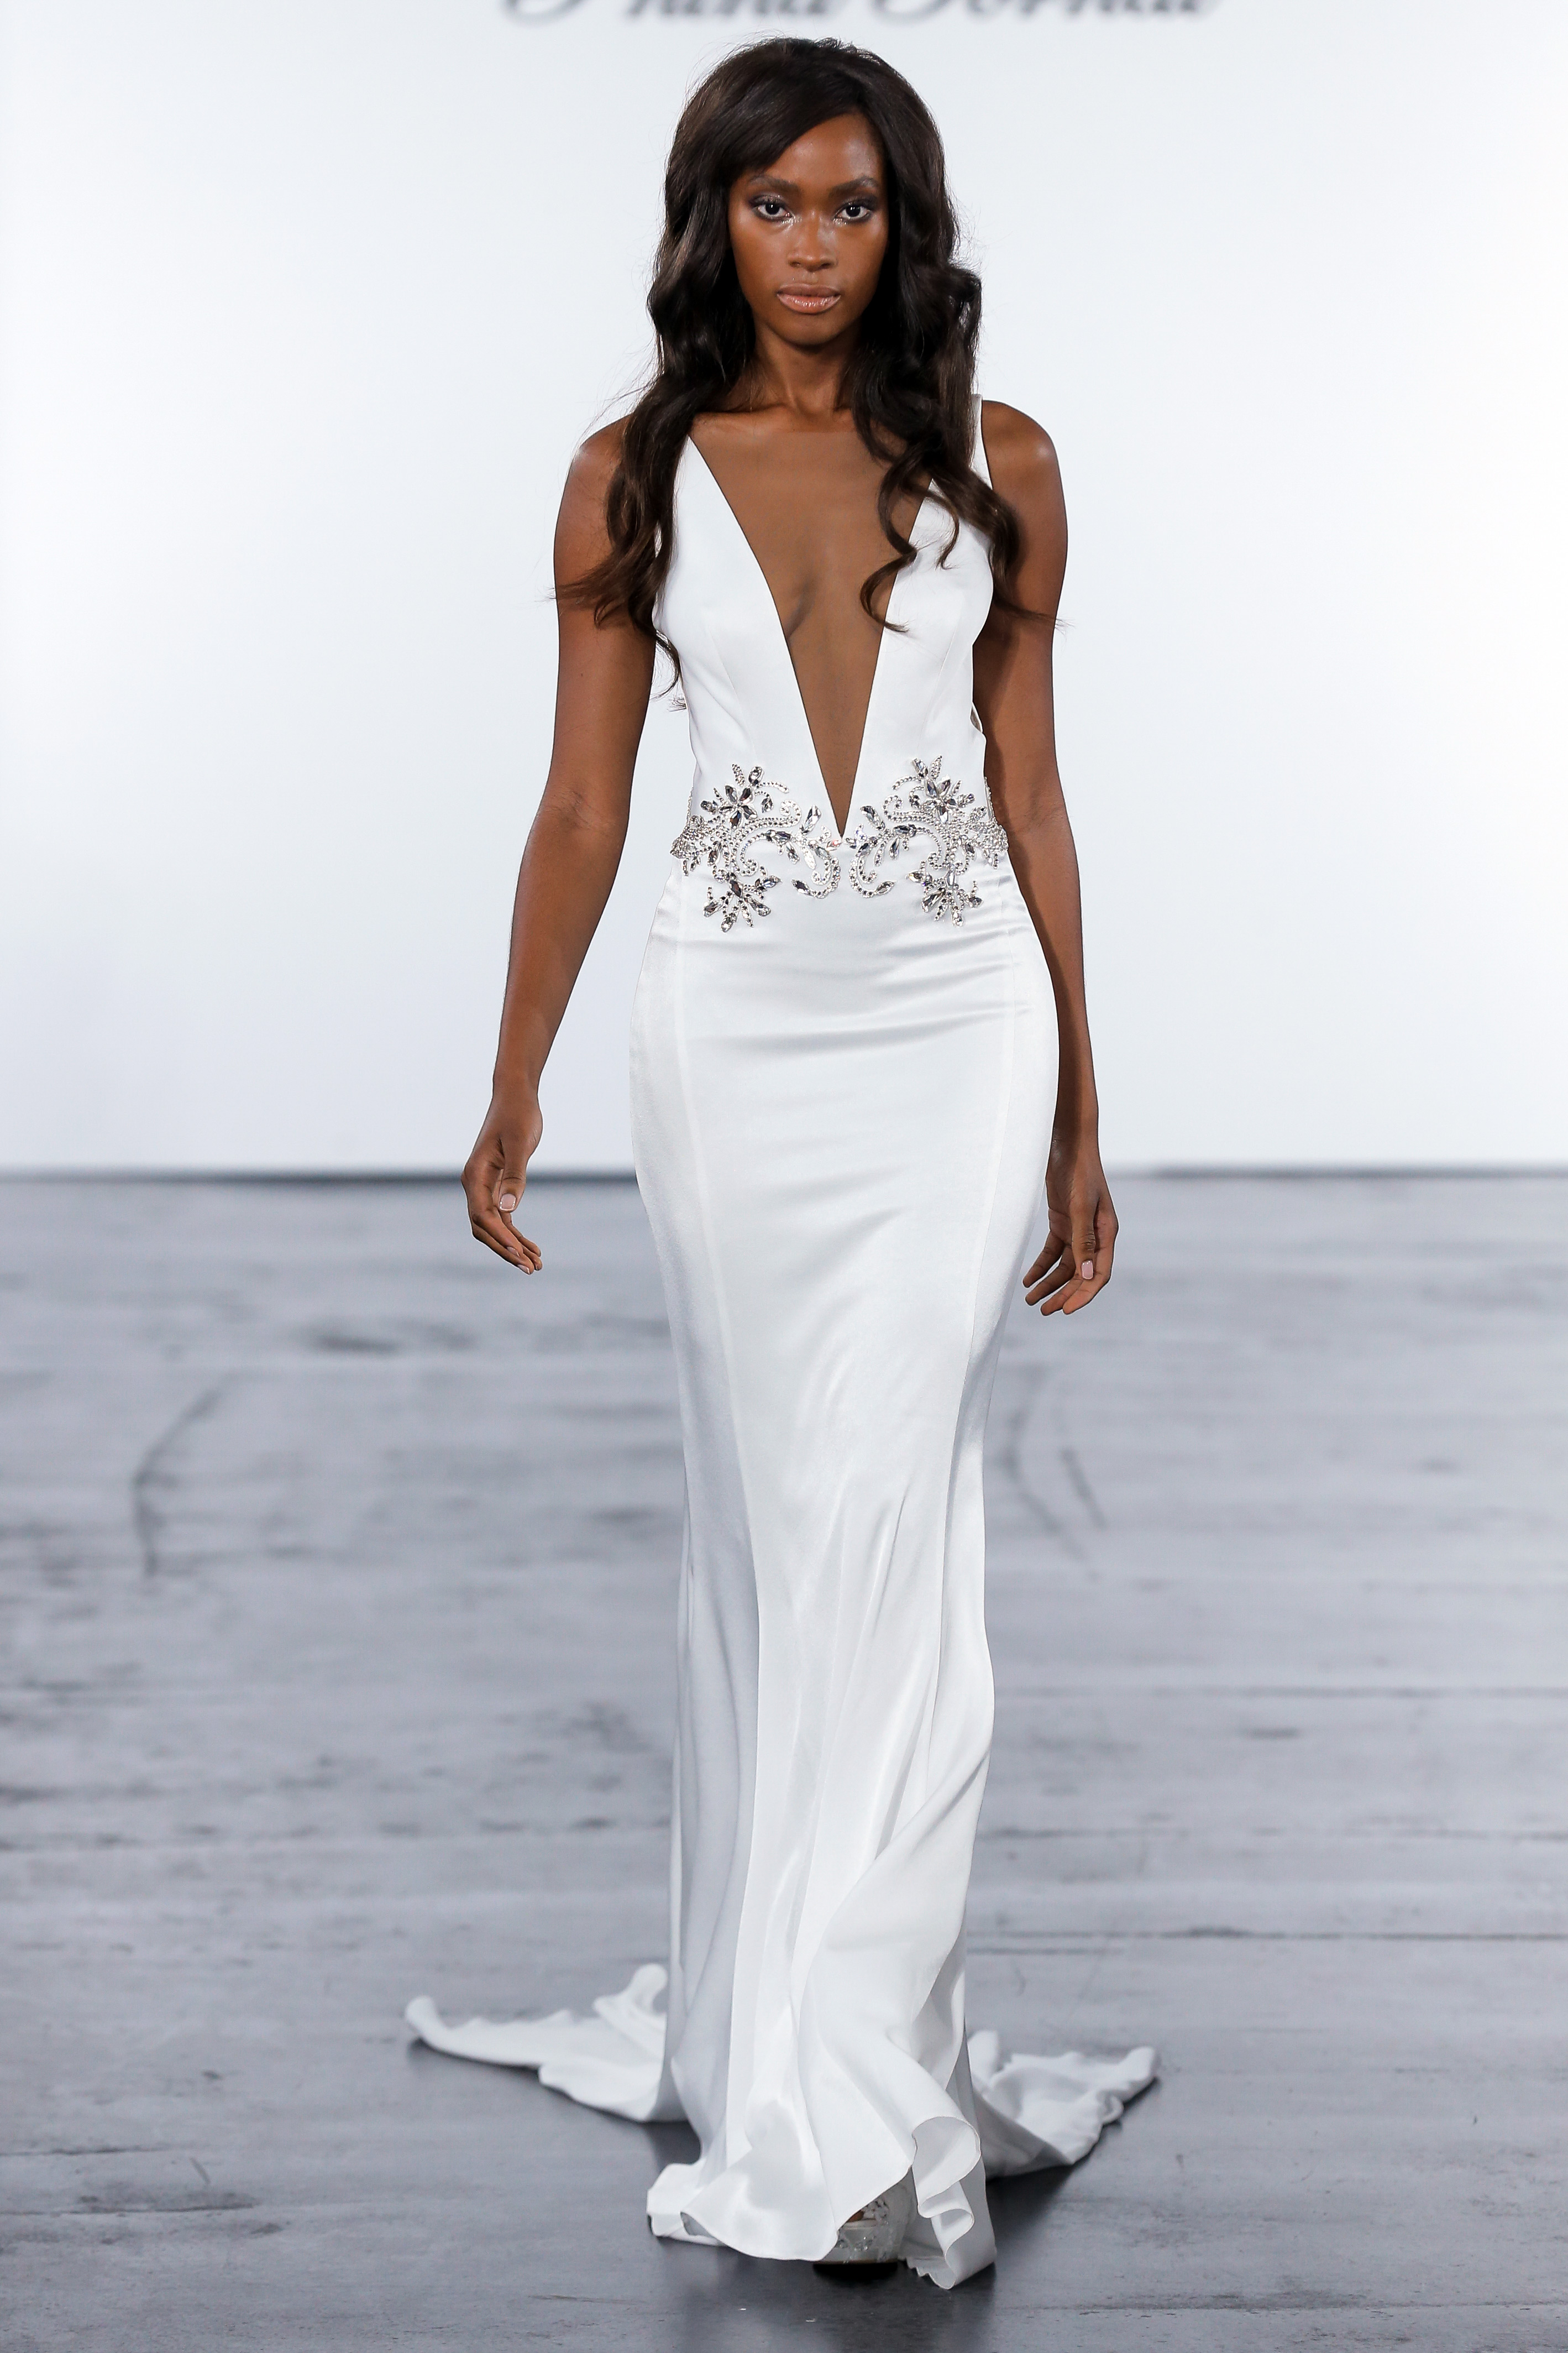 pnina tornai fall 2018 plunging v-neck wedding dress